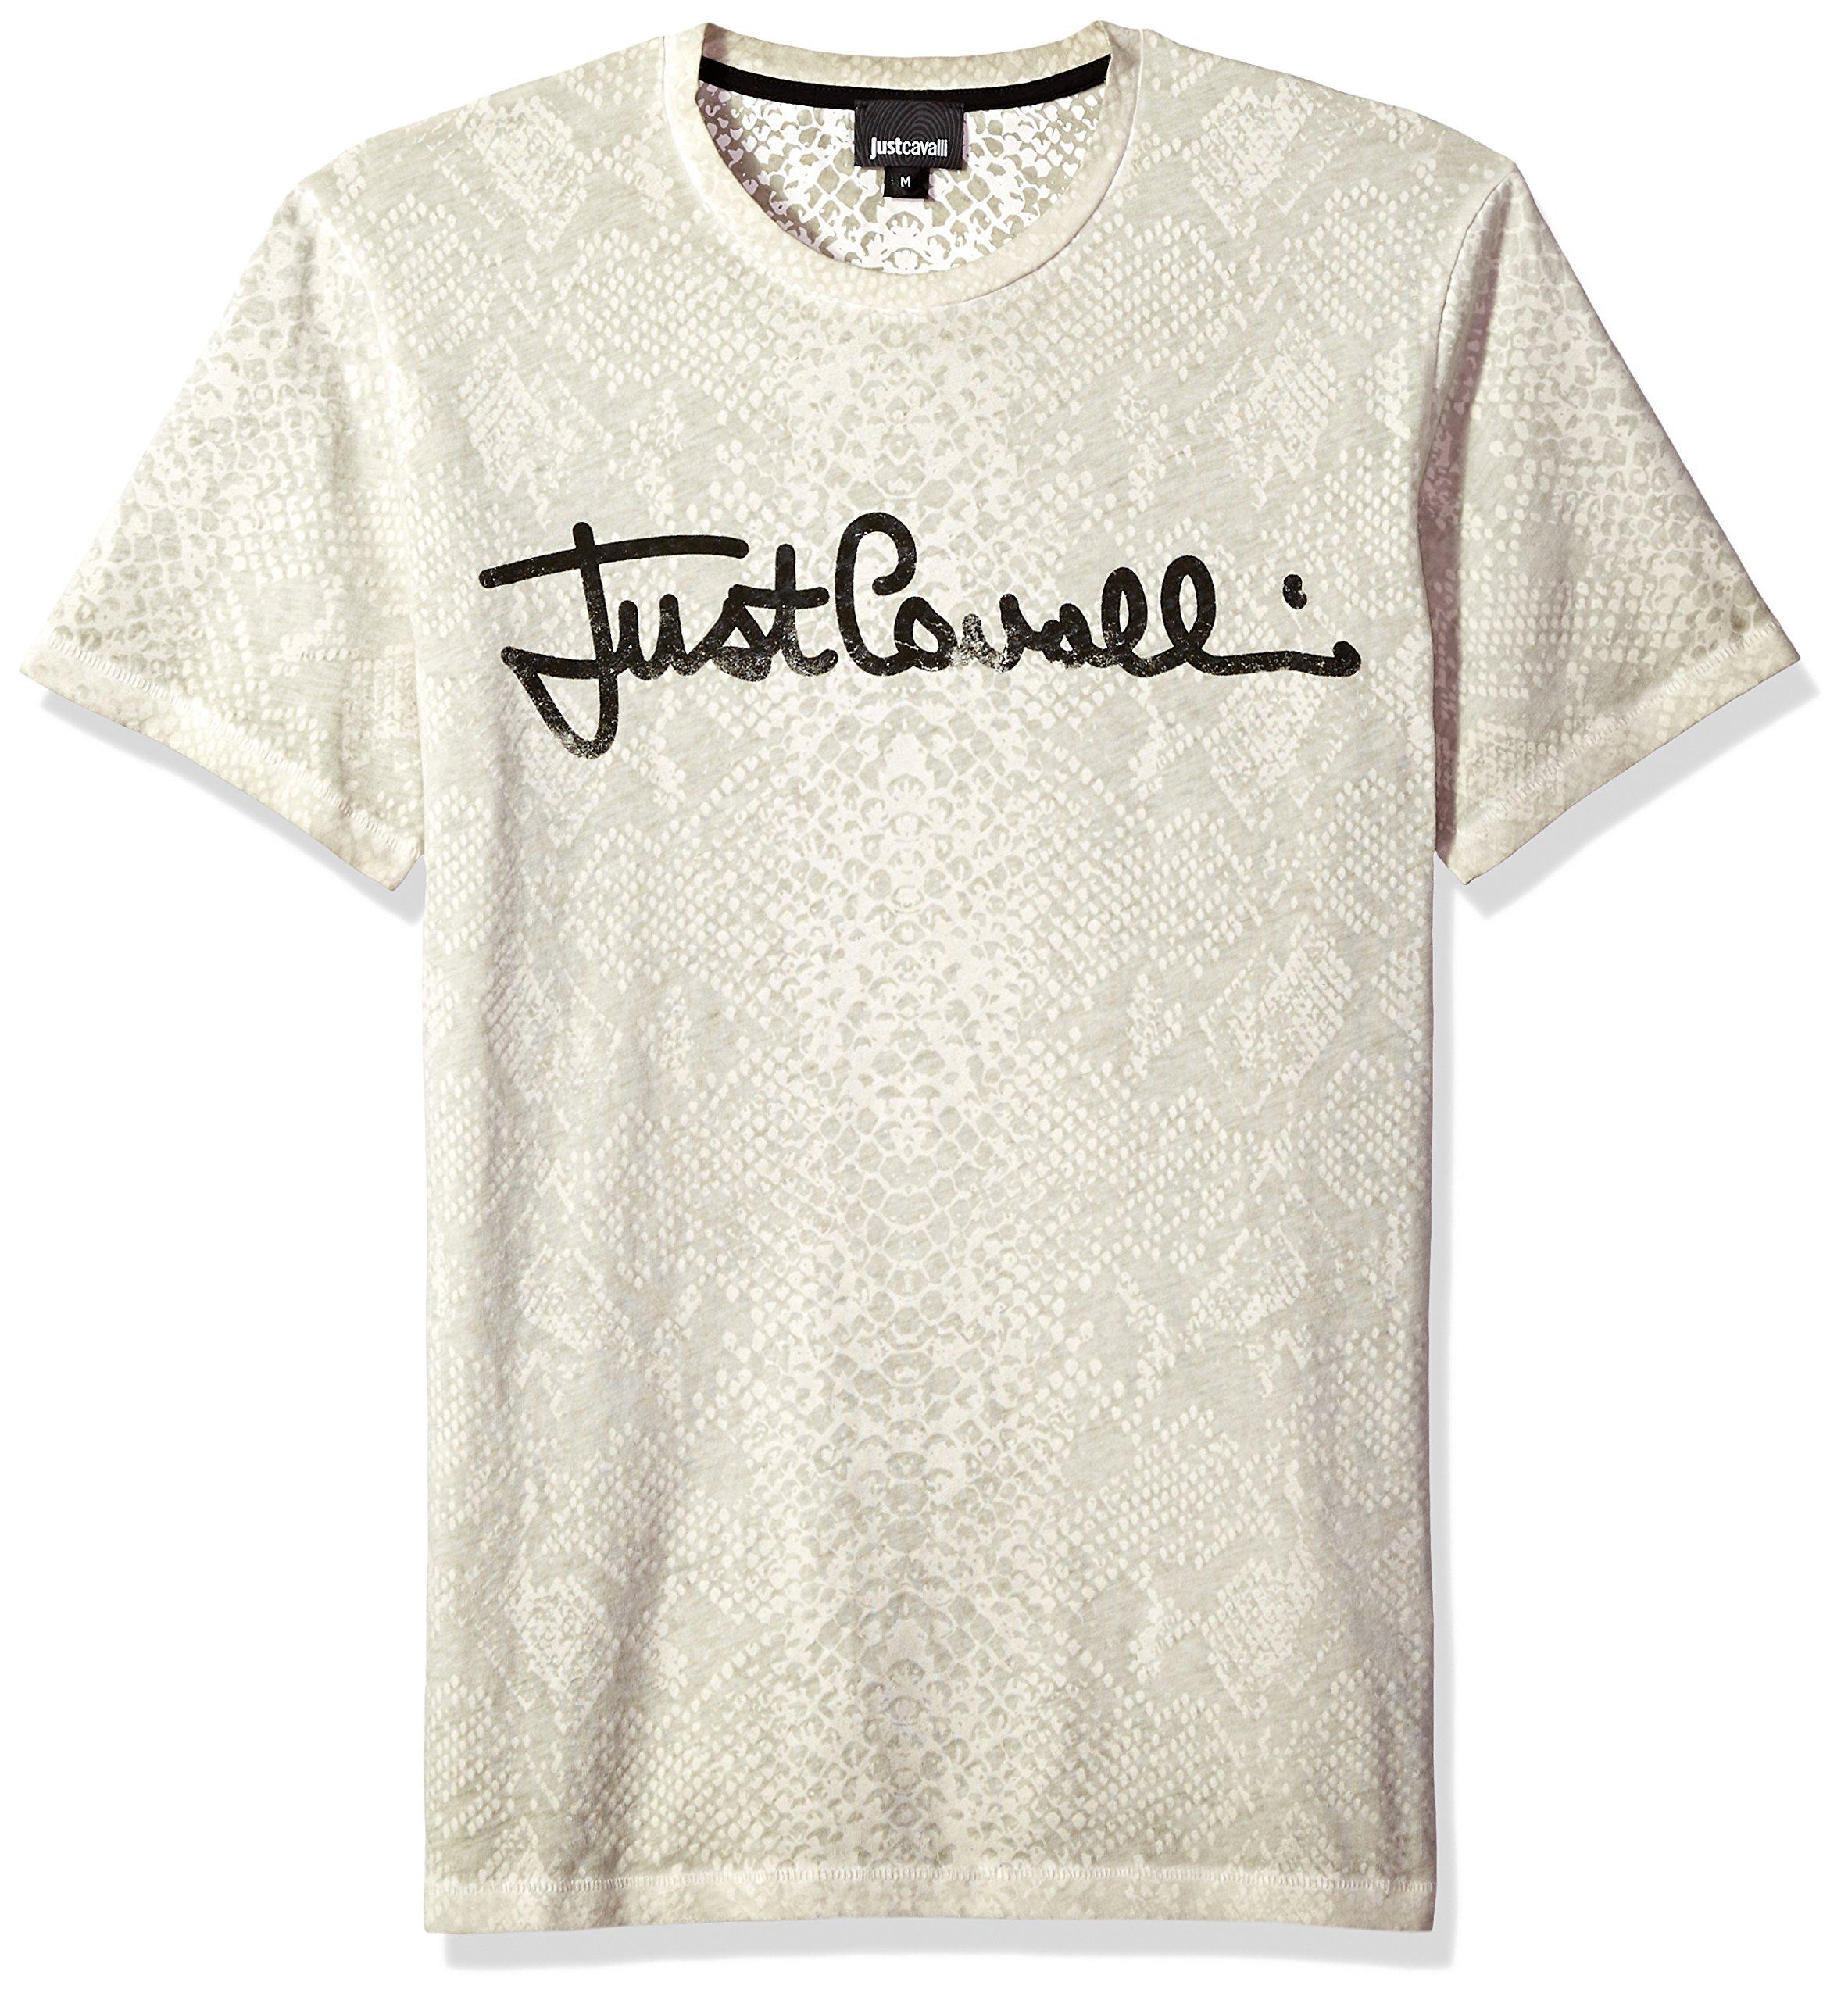 Just Cavalli Mens Signature Tee, Chalk M